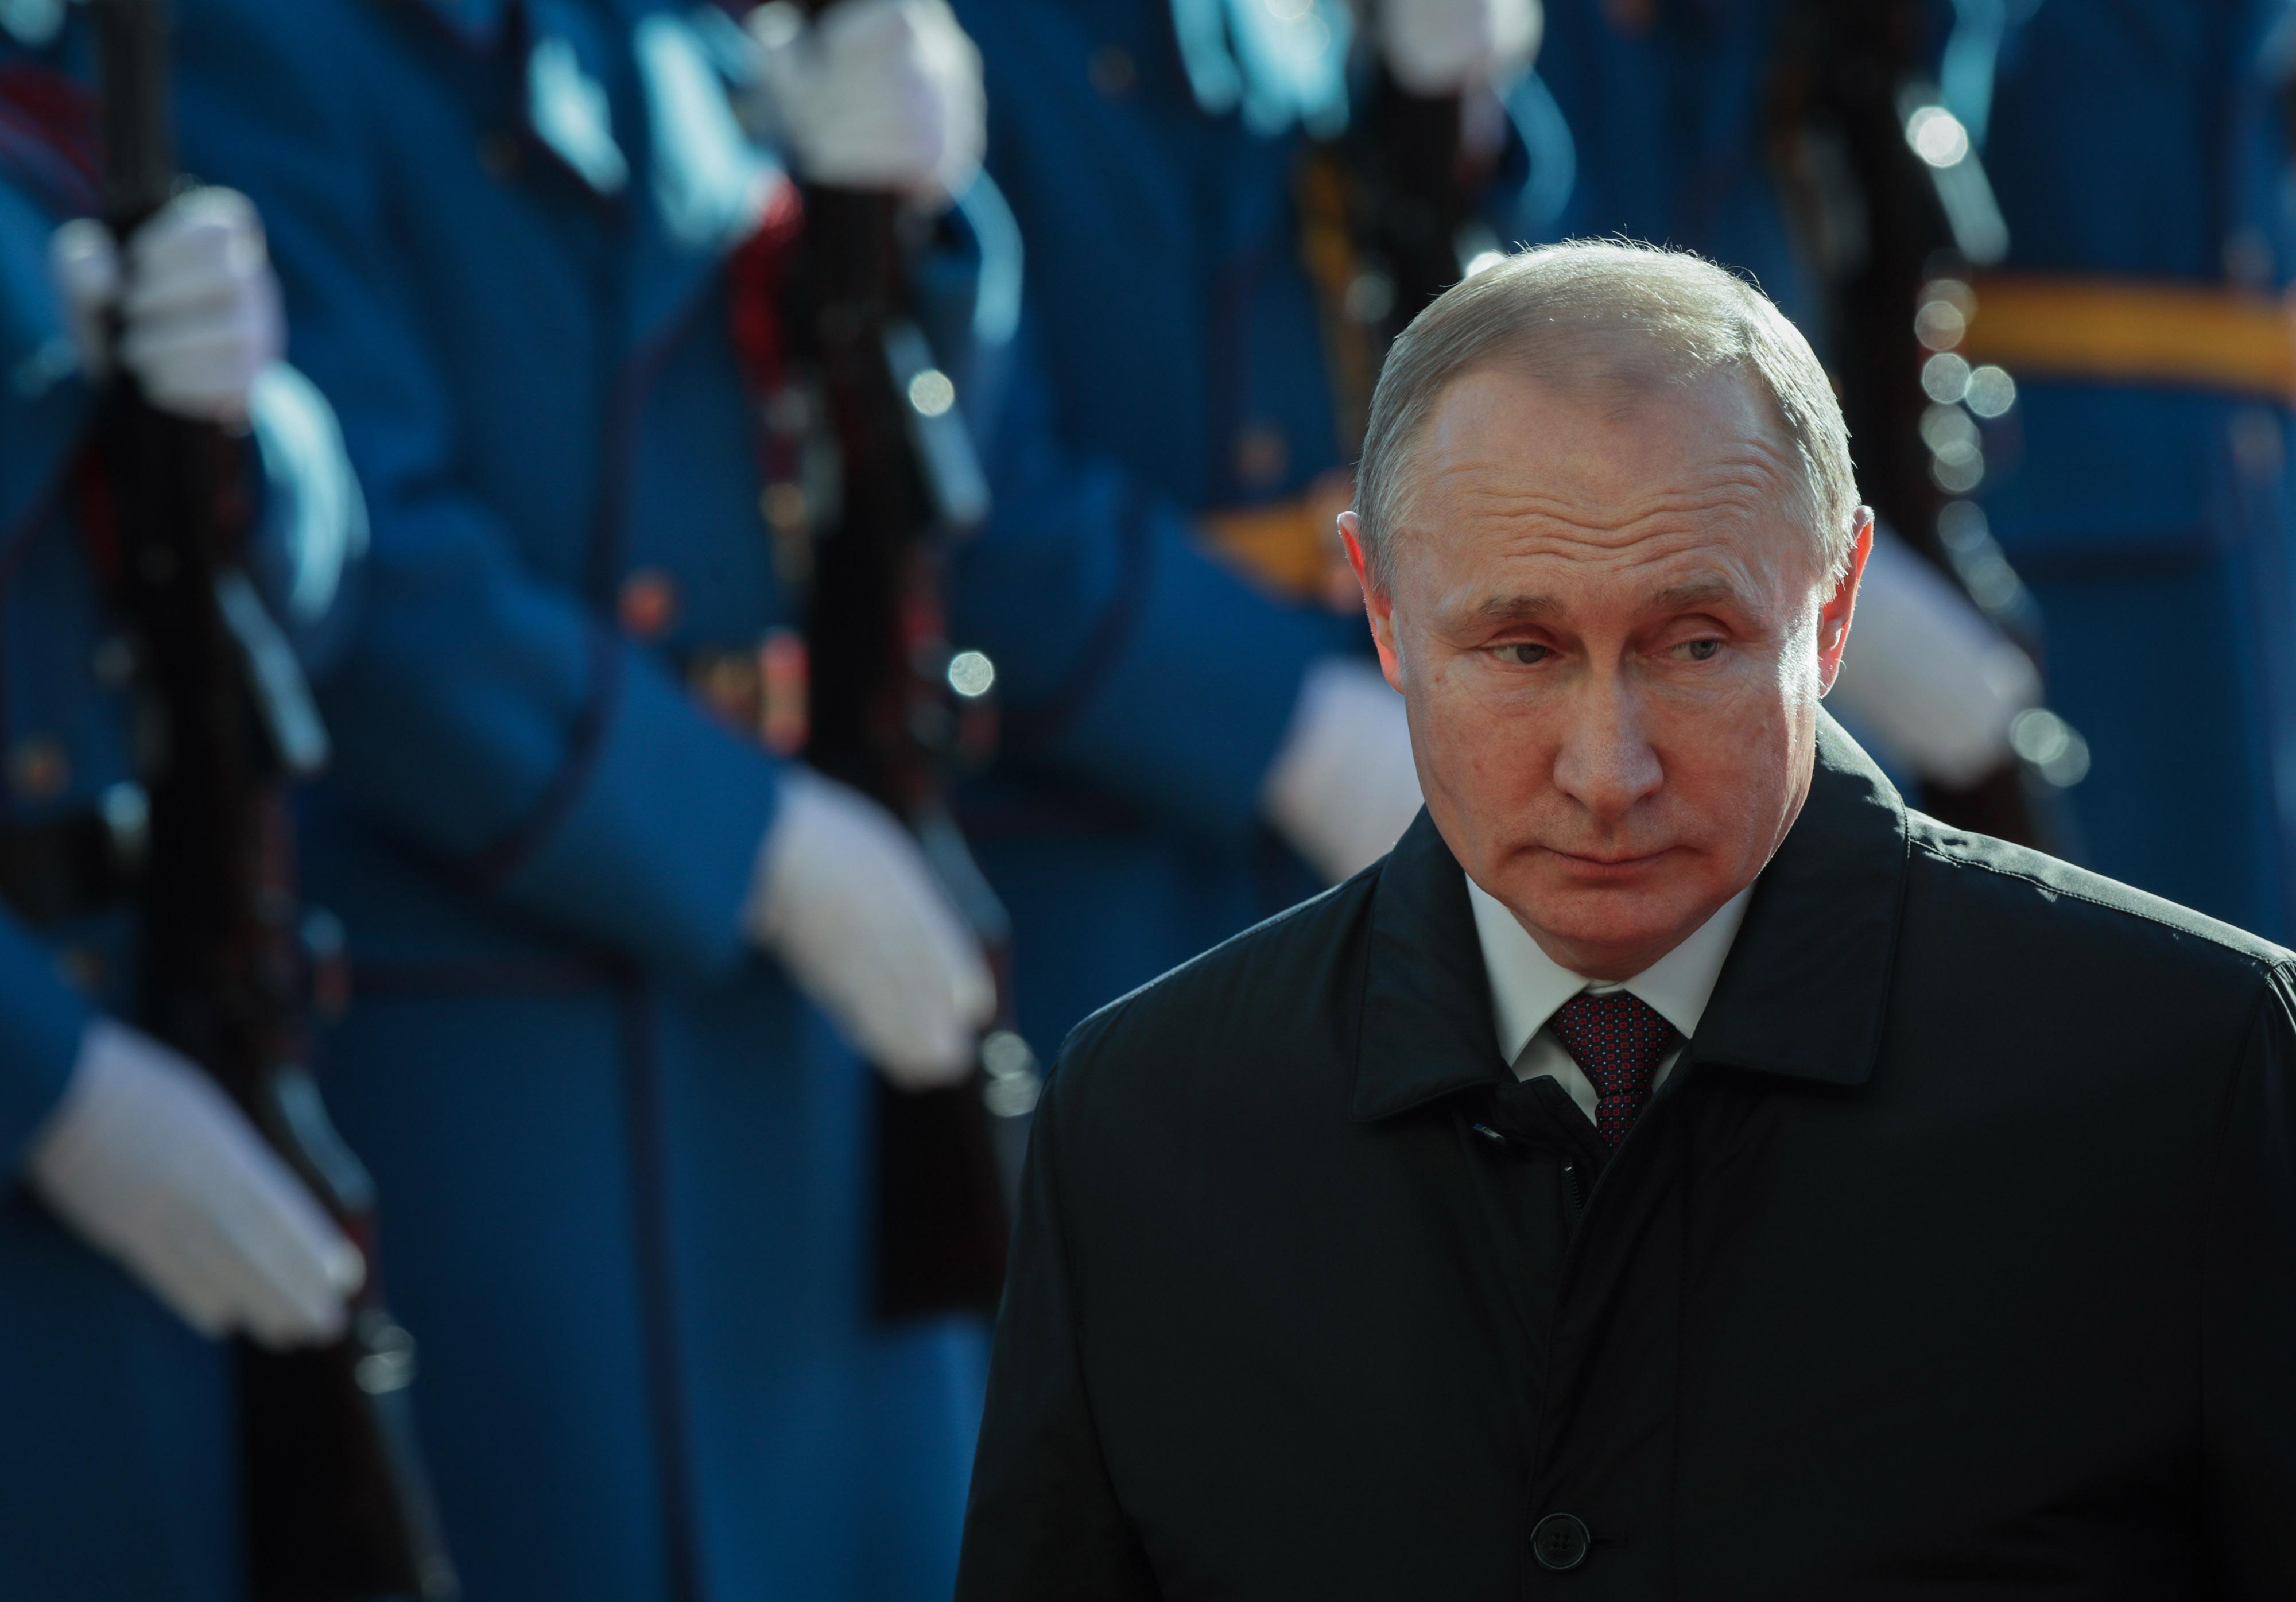 Vladimir Putin Kgb History Declassified Called Disciplined Spy Bloomberg